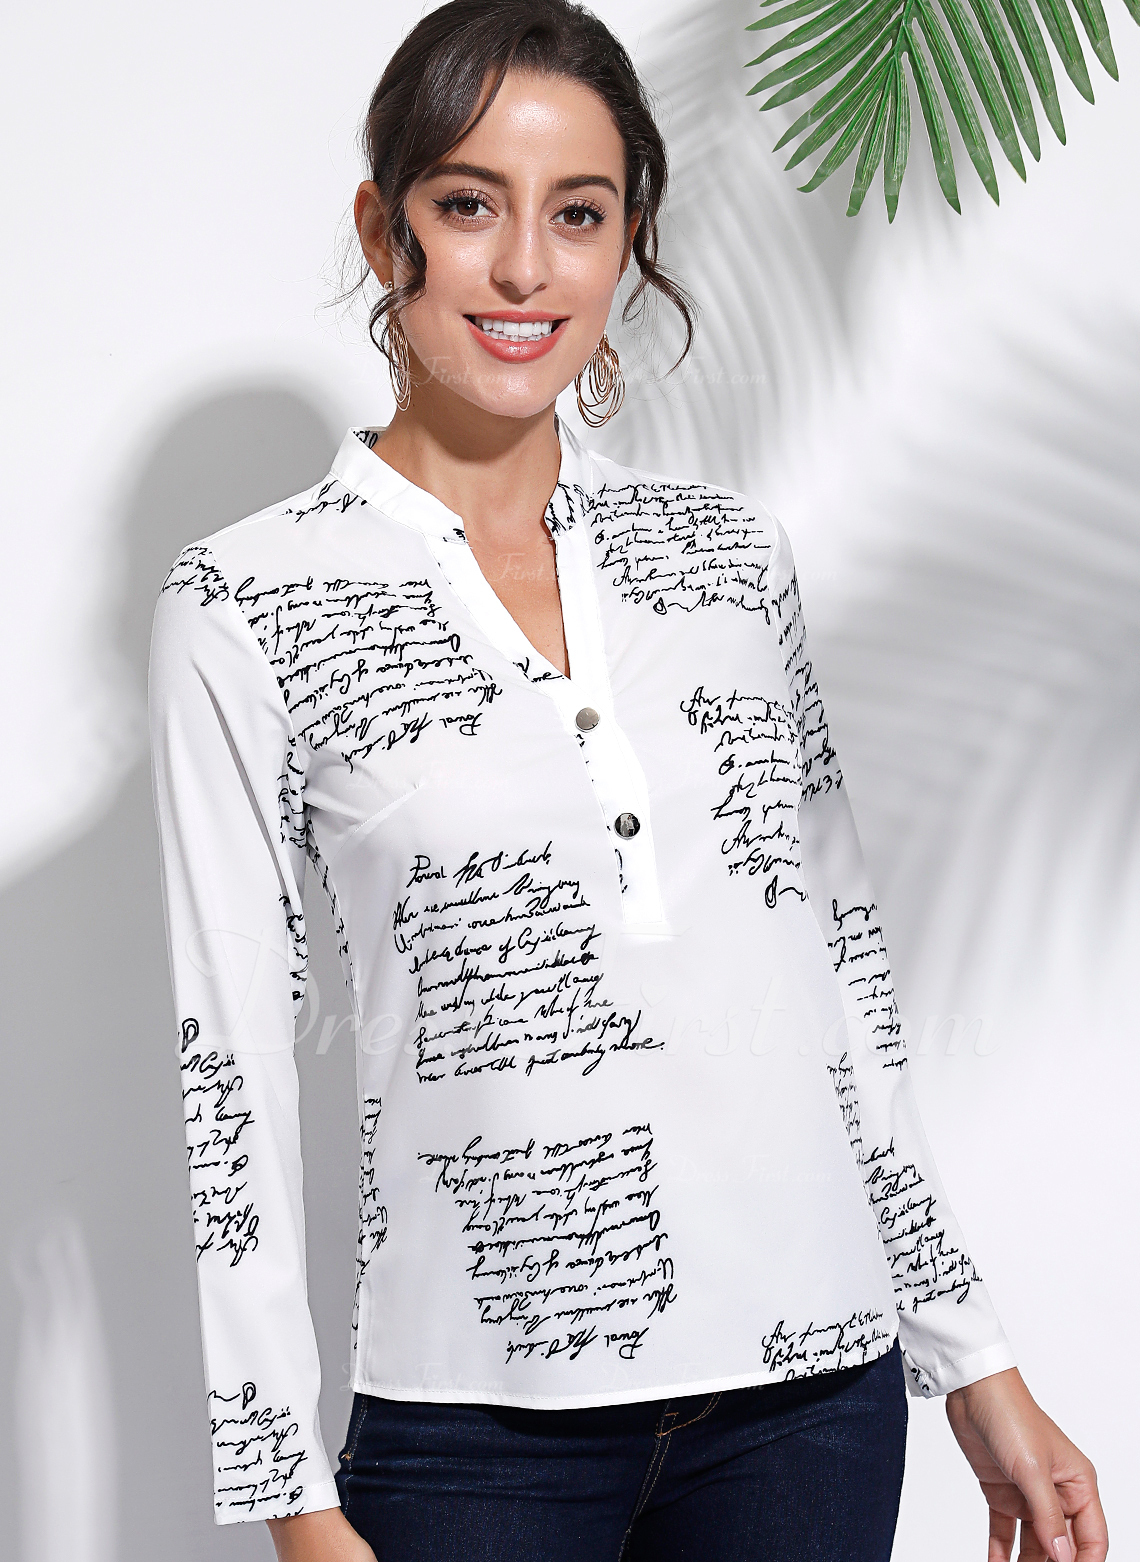 Impresión Manga larga Algodón mezcla de algodón Escote en V Camisas Blusas Blusas